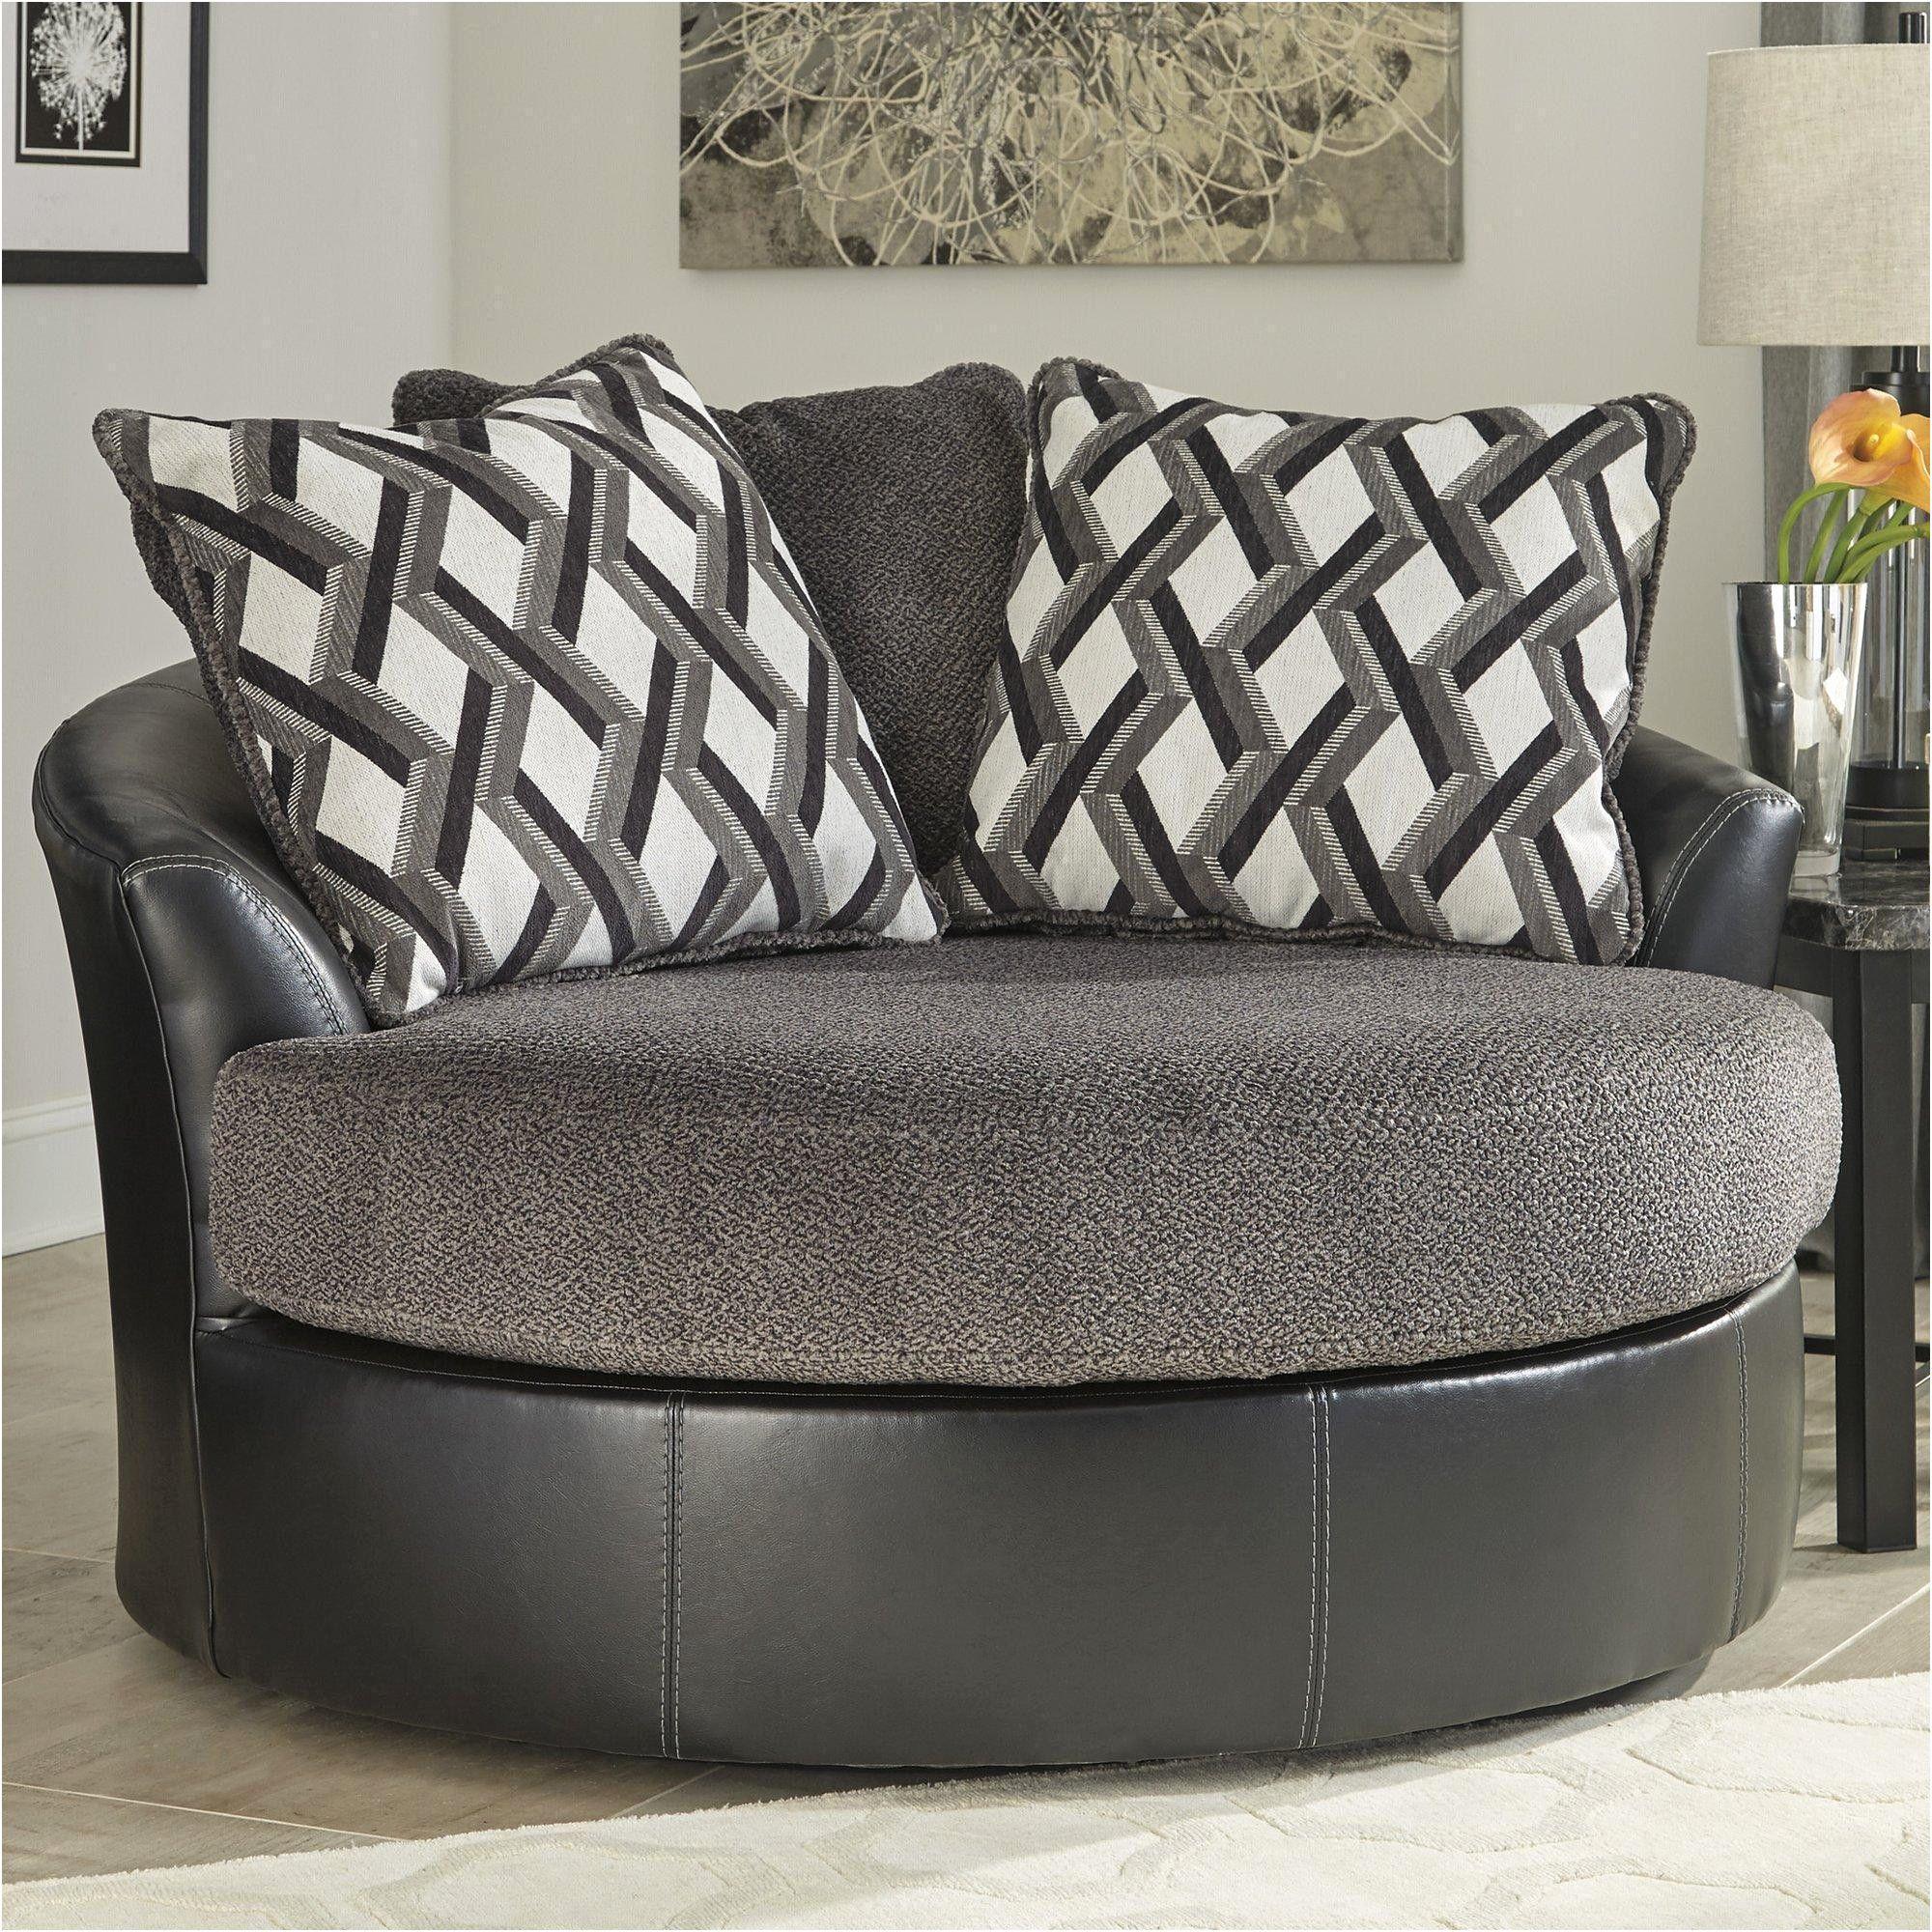 Sofa Home By Nirupama Dhaygude On Home Decor